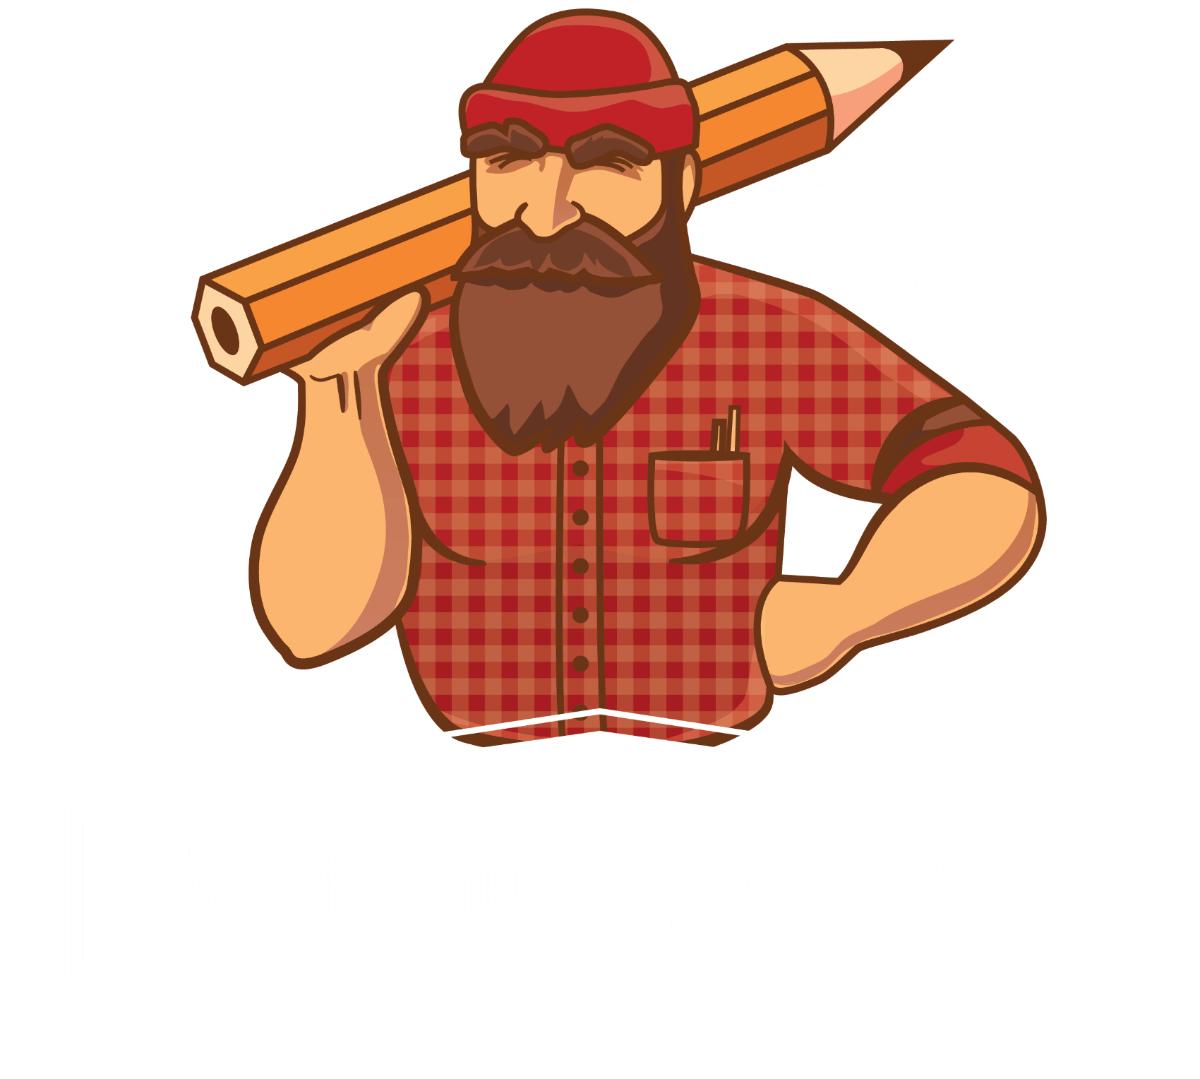 The animotioners explainer videos. Lumberjack clipart lumberjack beard